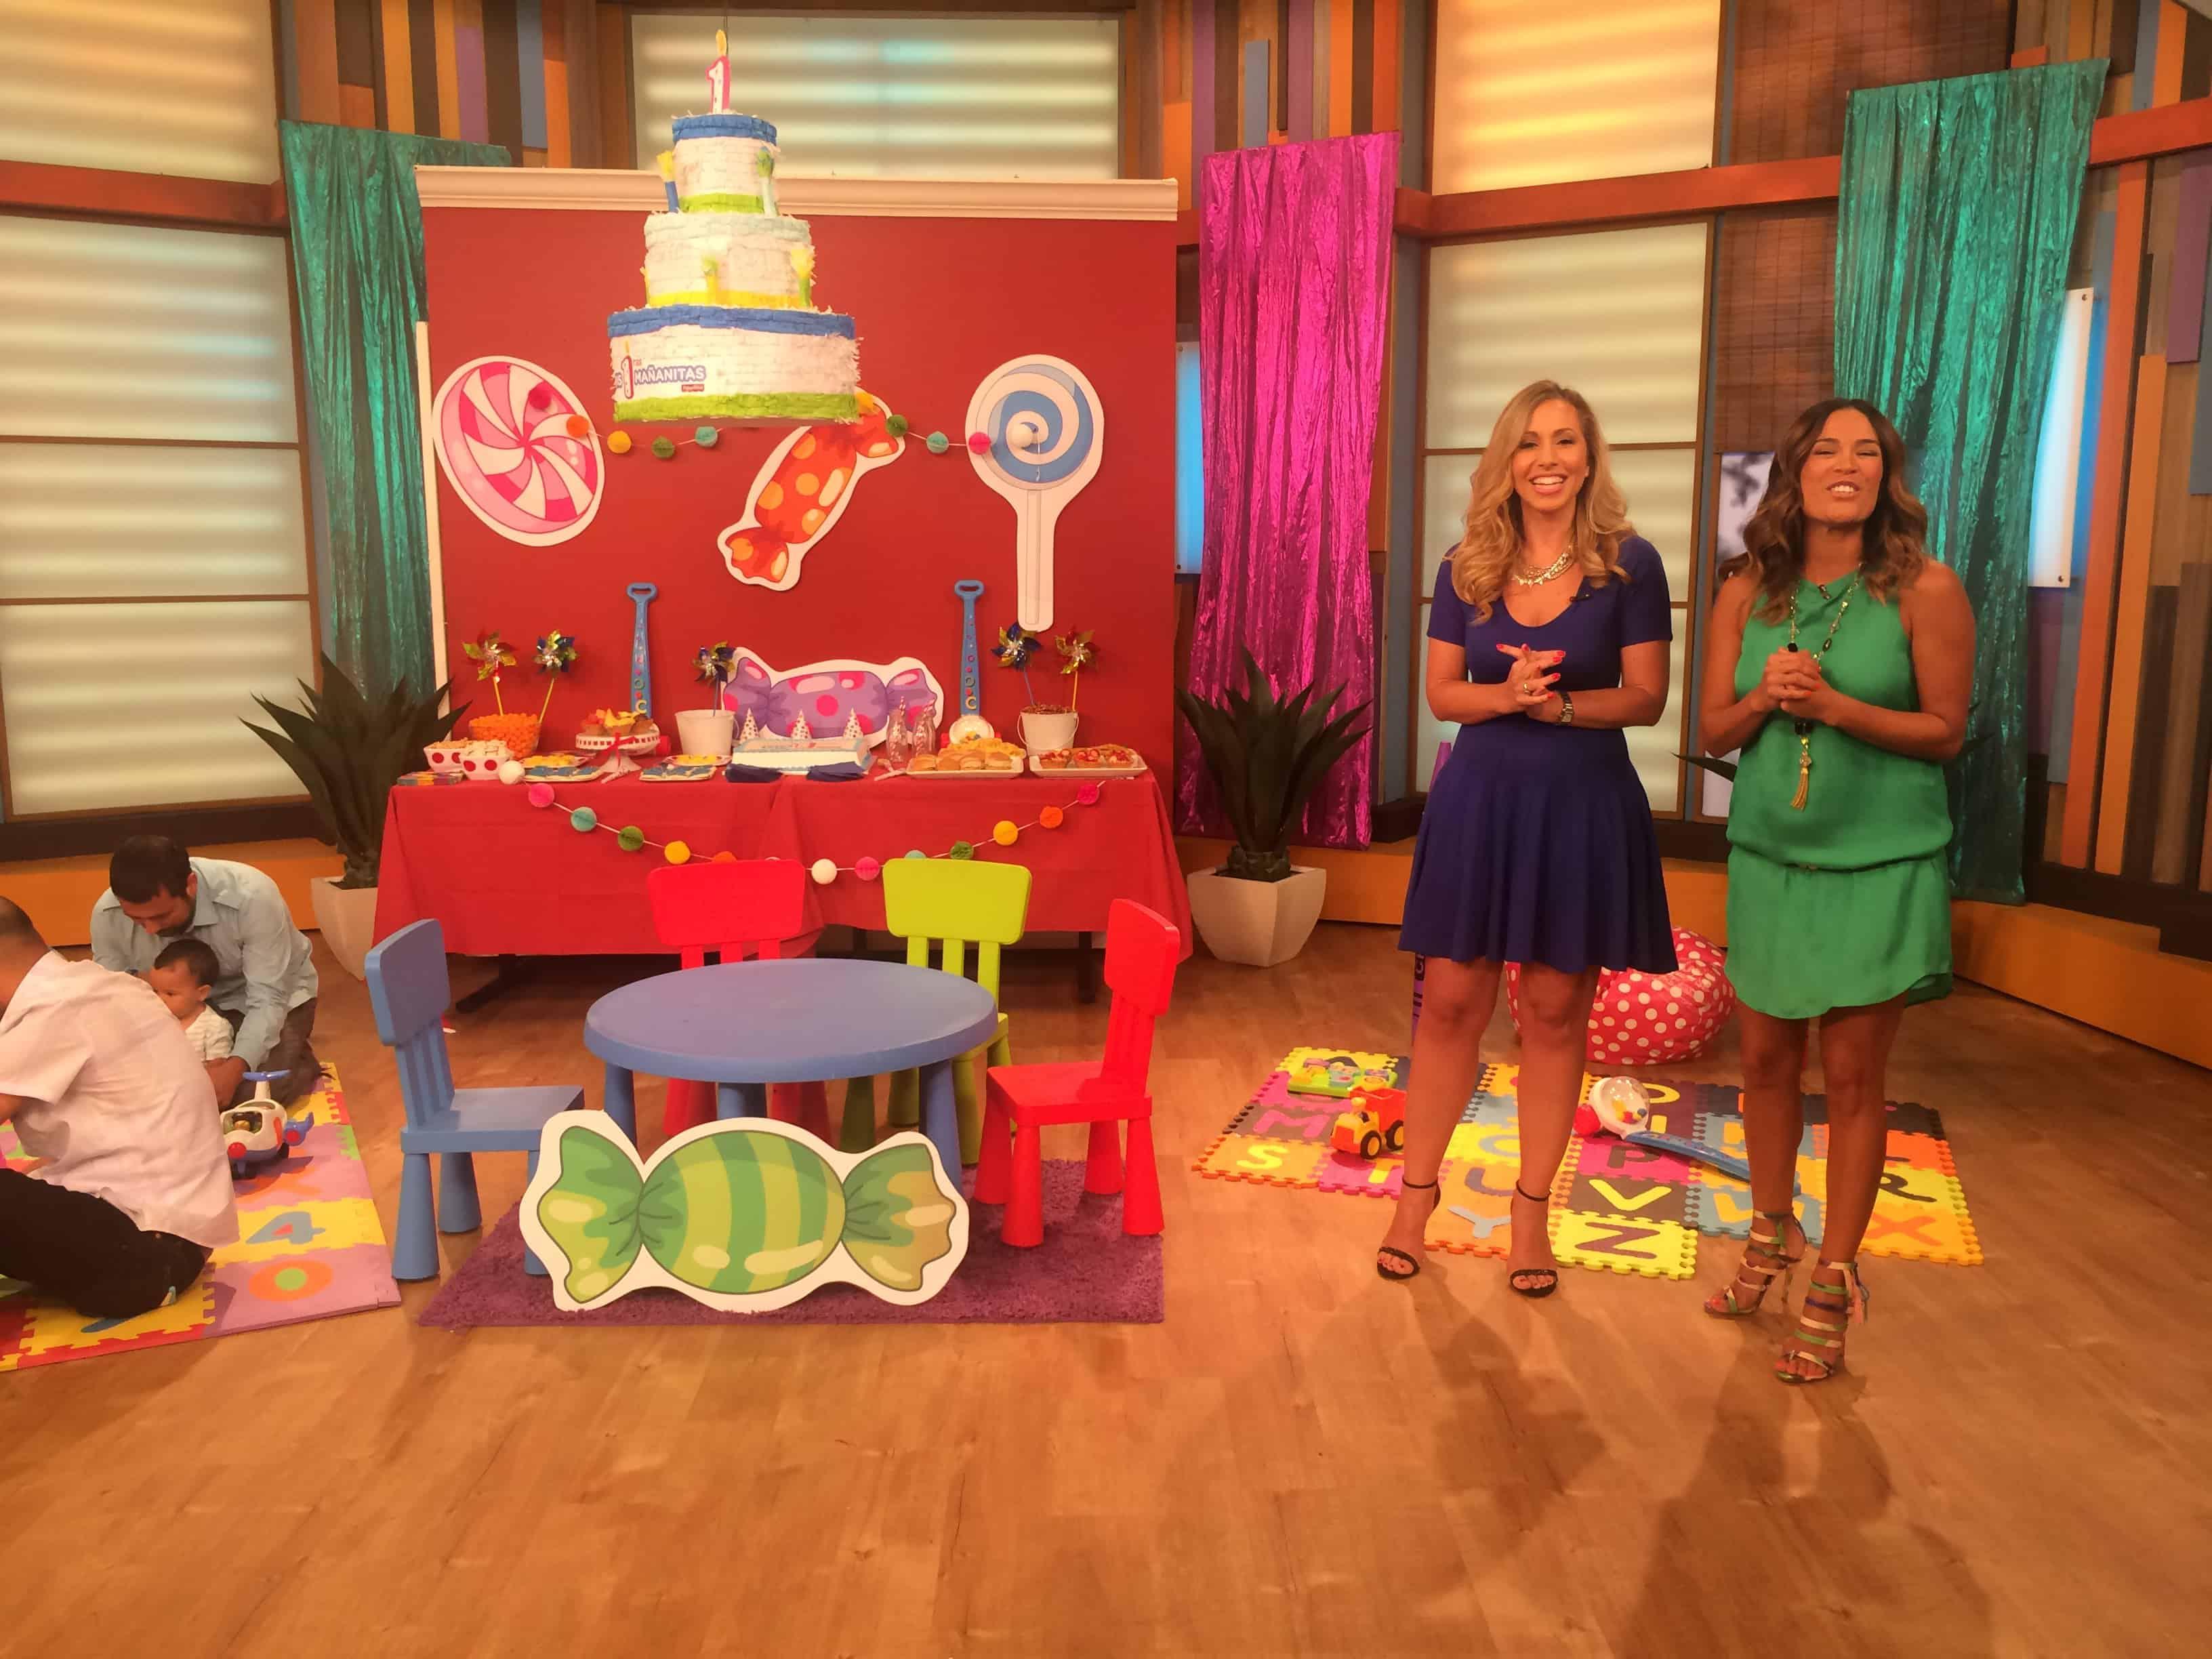 7 consejos para el primer cumpleaños de tu bebé - Hispana Global